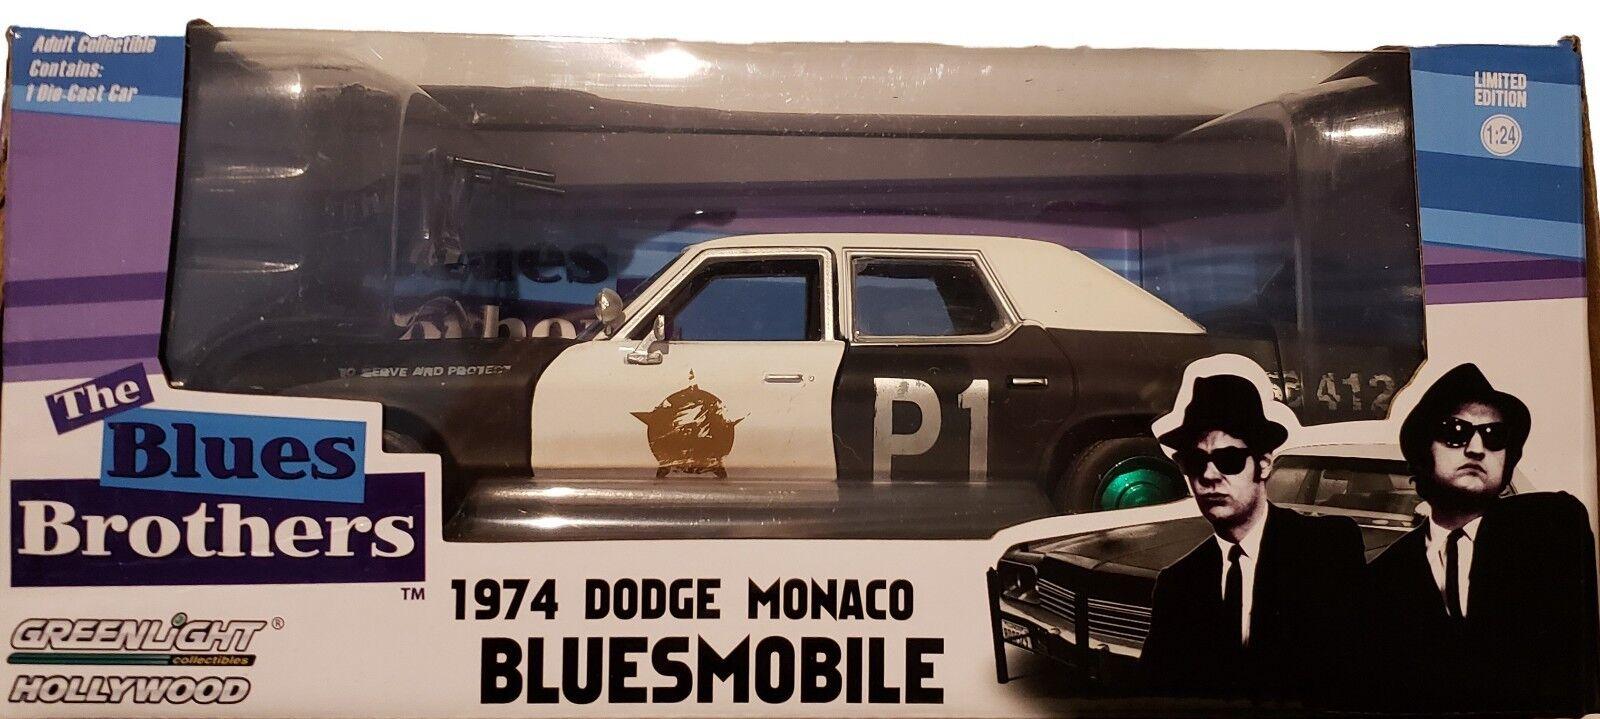 Máquina verde verdeLight Chase 84011 1974 Dodge Monaco s azulsmobile escala 1 24